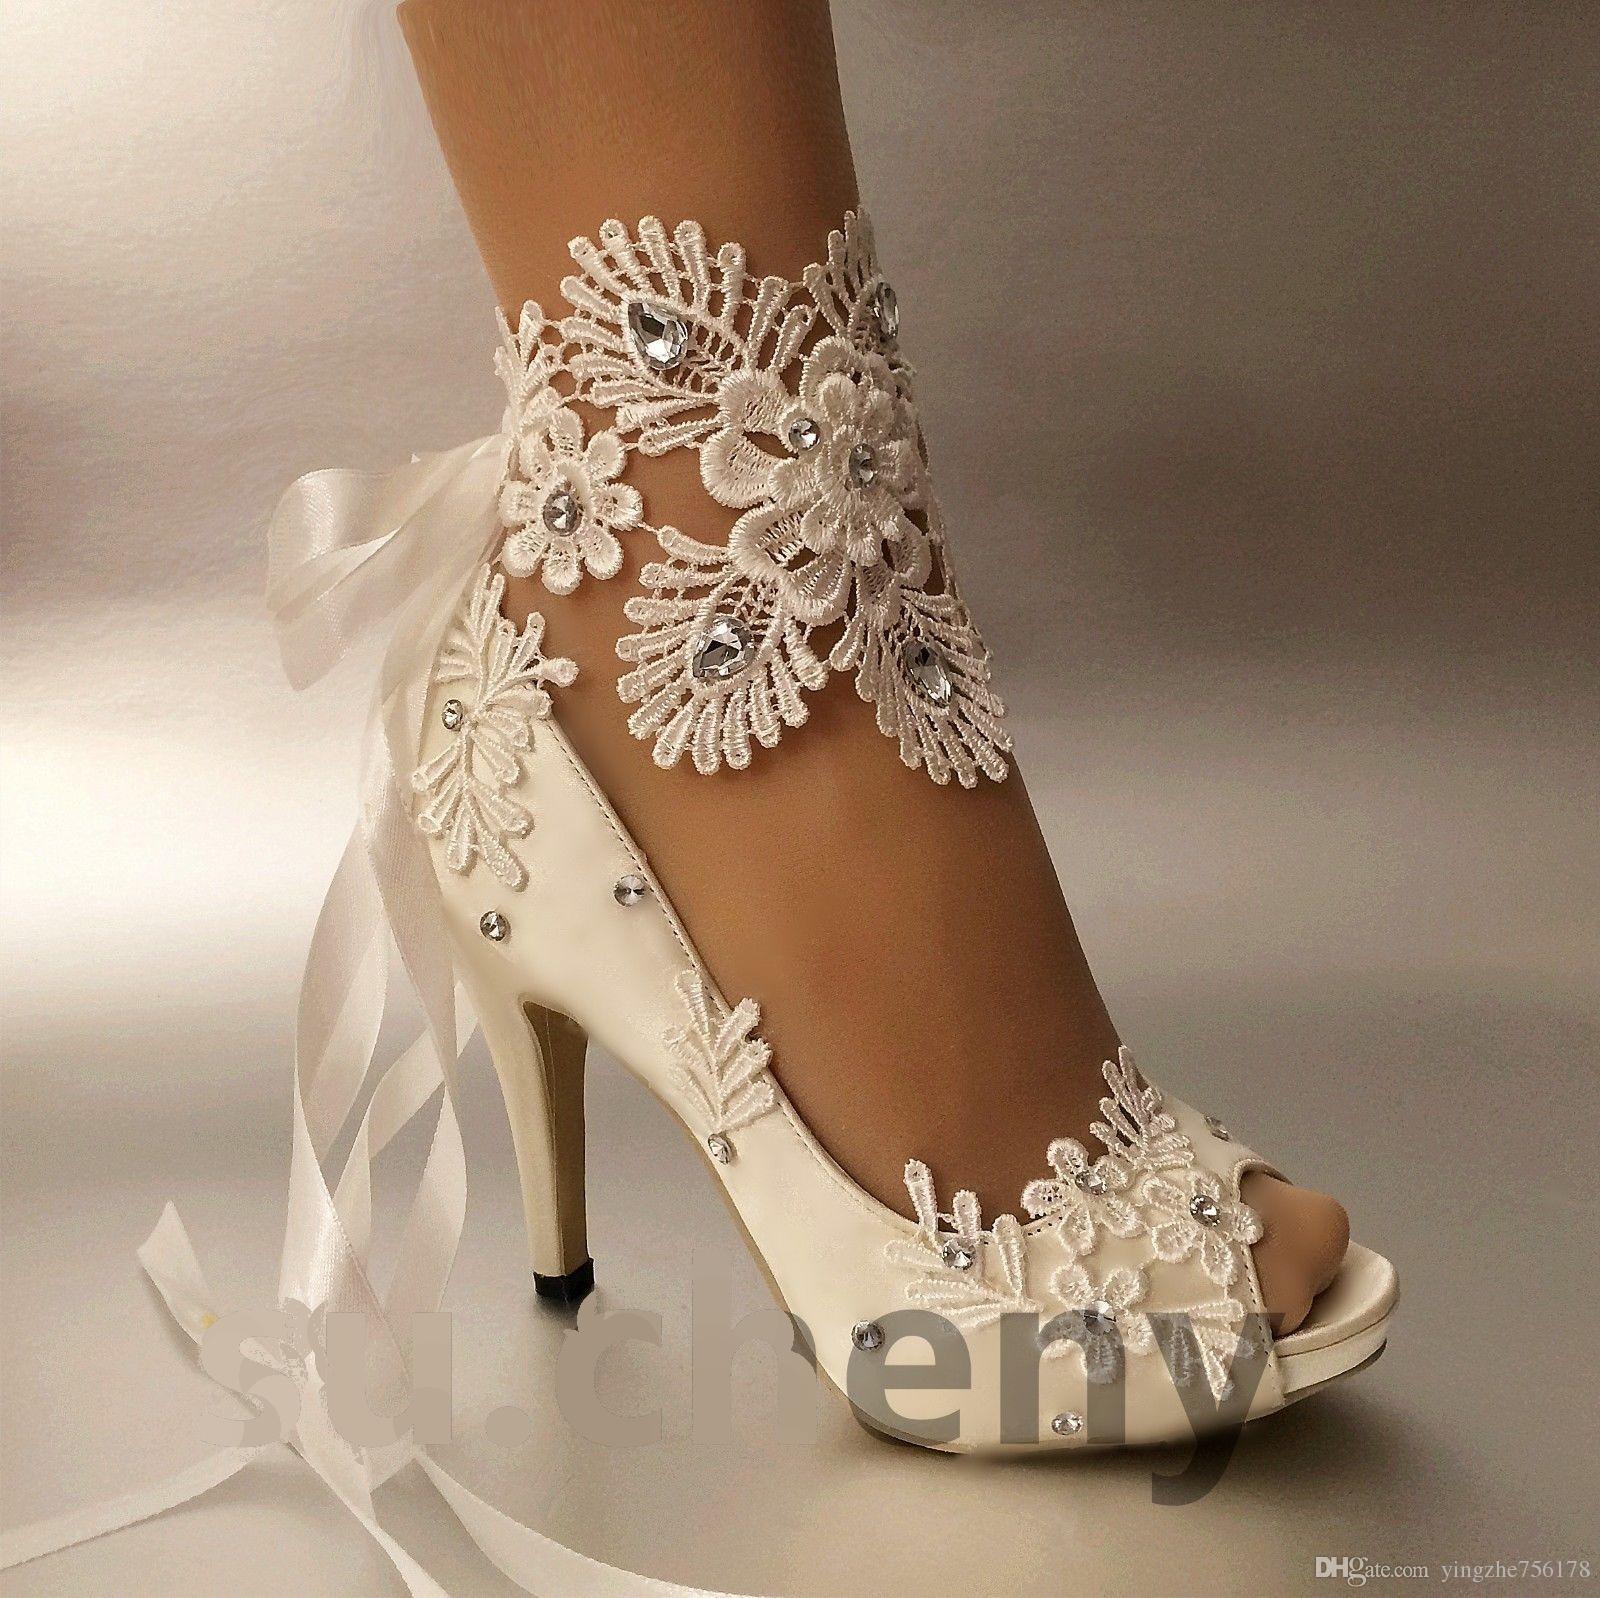 Handmade Women Fashion Ivory Ribbon Wedding Shoes Heel Ballet Lace Flower  Bridal Bridesmaid Shoes Size 35 42 Ivory Kitten Heel Wedding Shoes Ivory  Wedding ... 4b71ee6af3